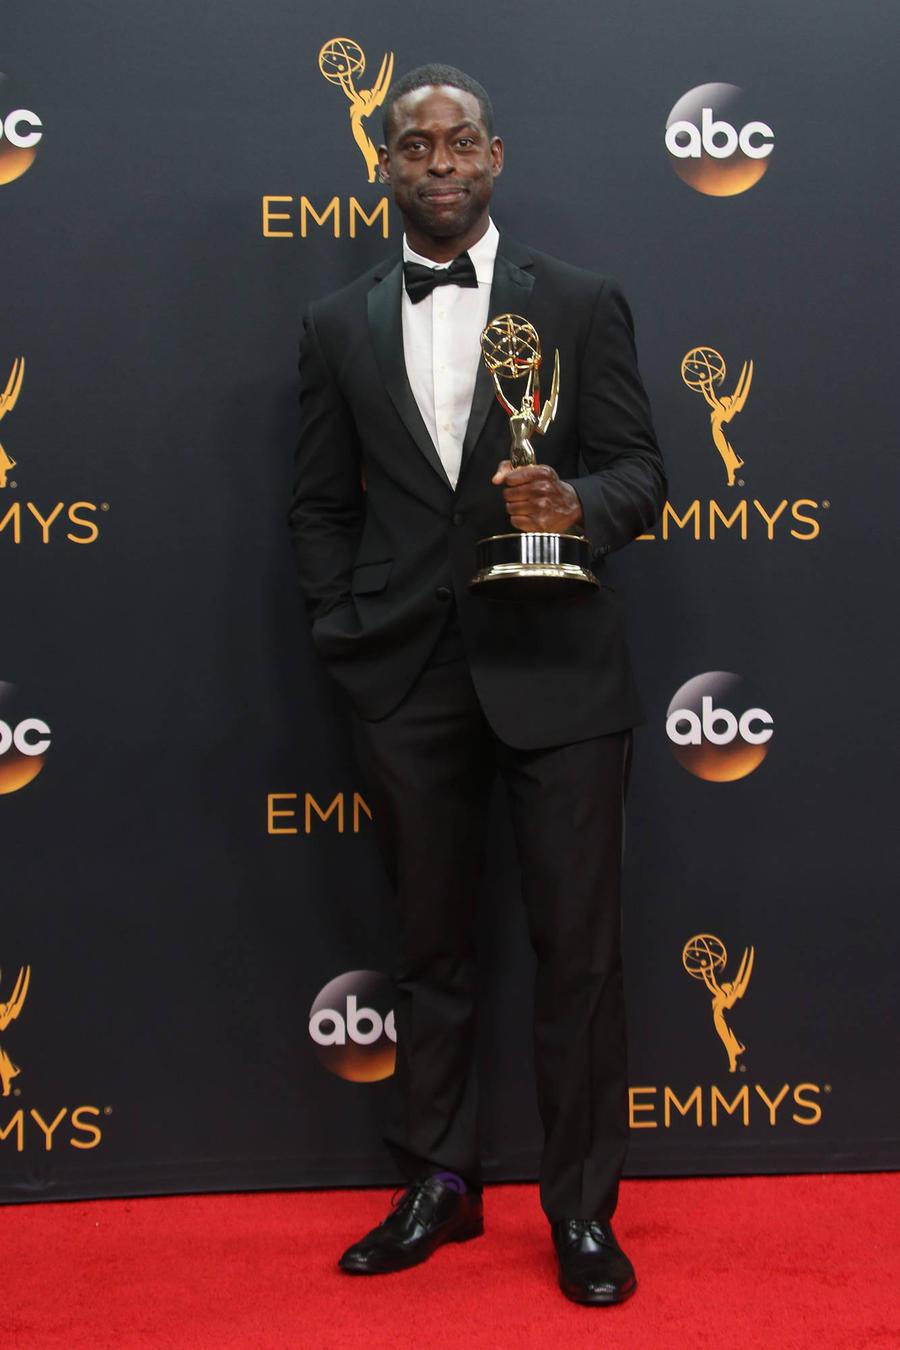 O.j. Simpson Attorney Christopher Darden Glad Sterling K. Brown Won Emmy